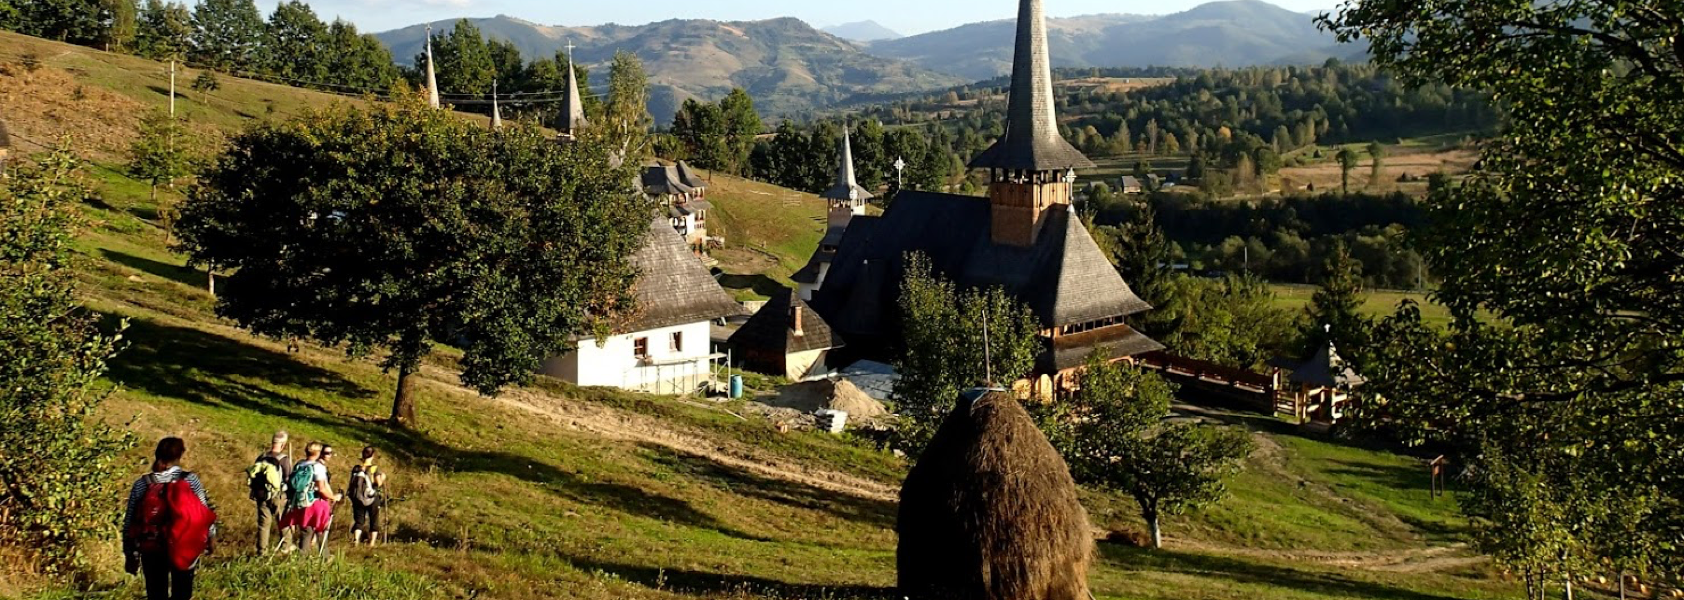 Roemenië | Single wandelreis Roemenië